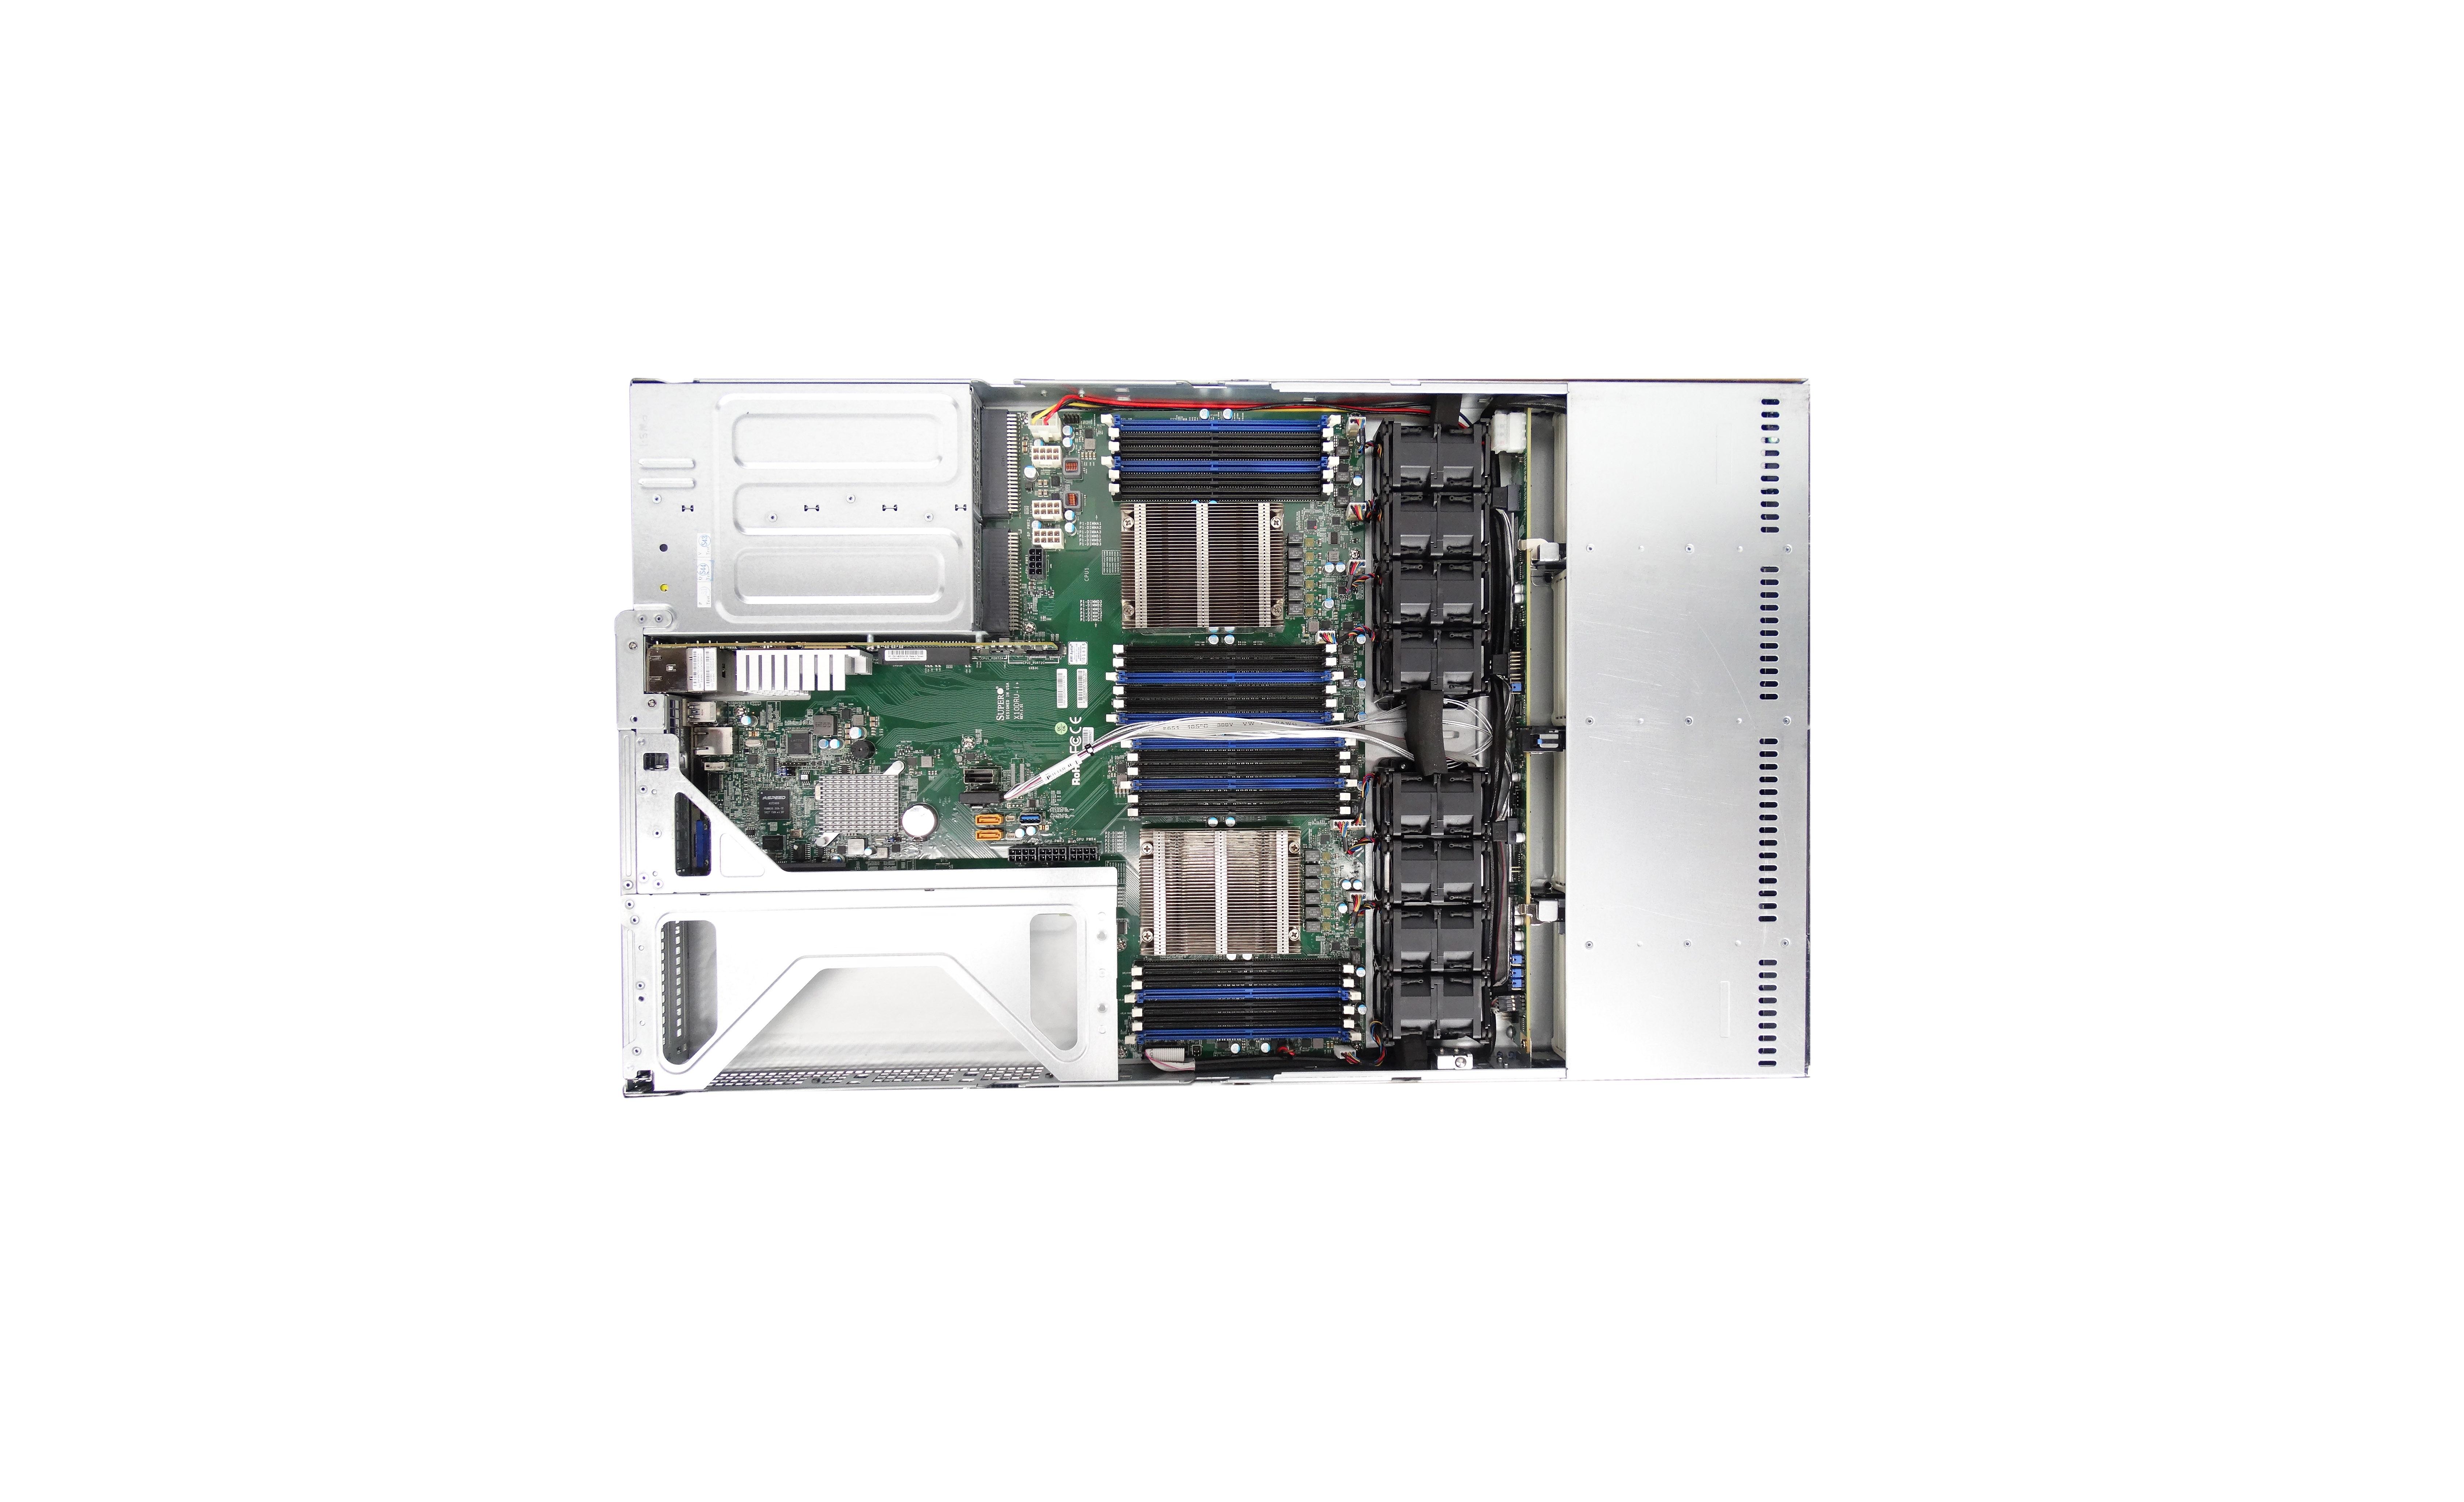 Supermicro-6018U-TR4T-4-Bay-1U-2x-Xeon-E5-2650-V3-2-3GHz-10C-32GB-4x-3TB-SATA thumbnail 3